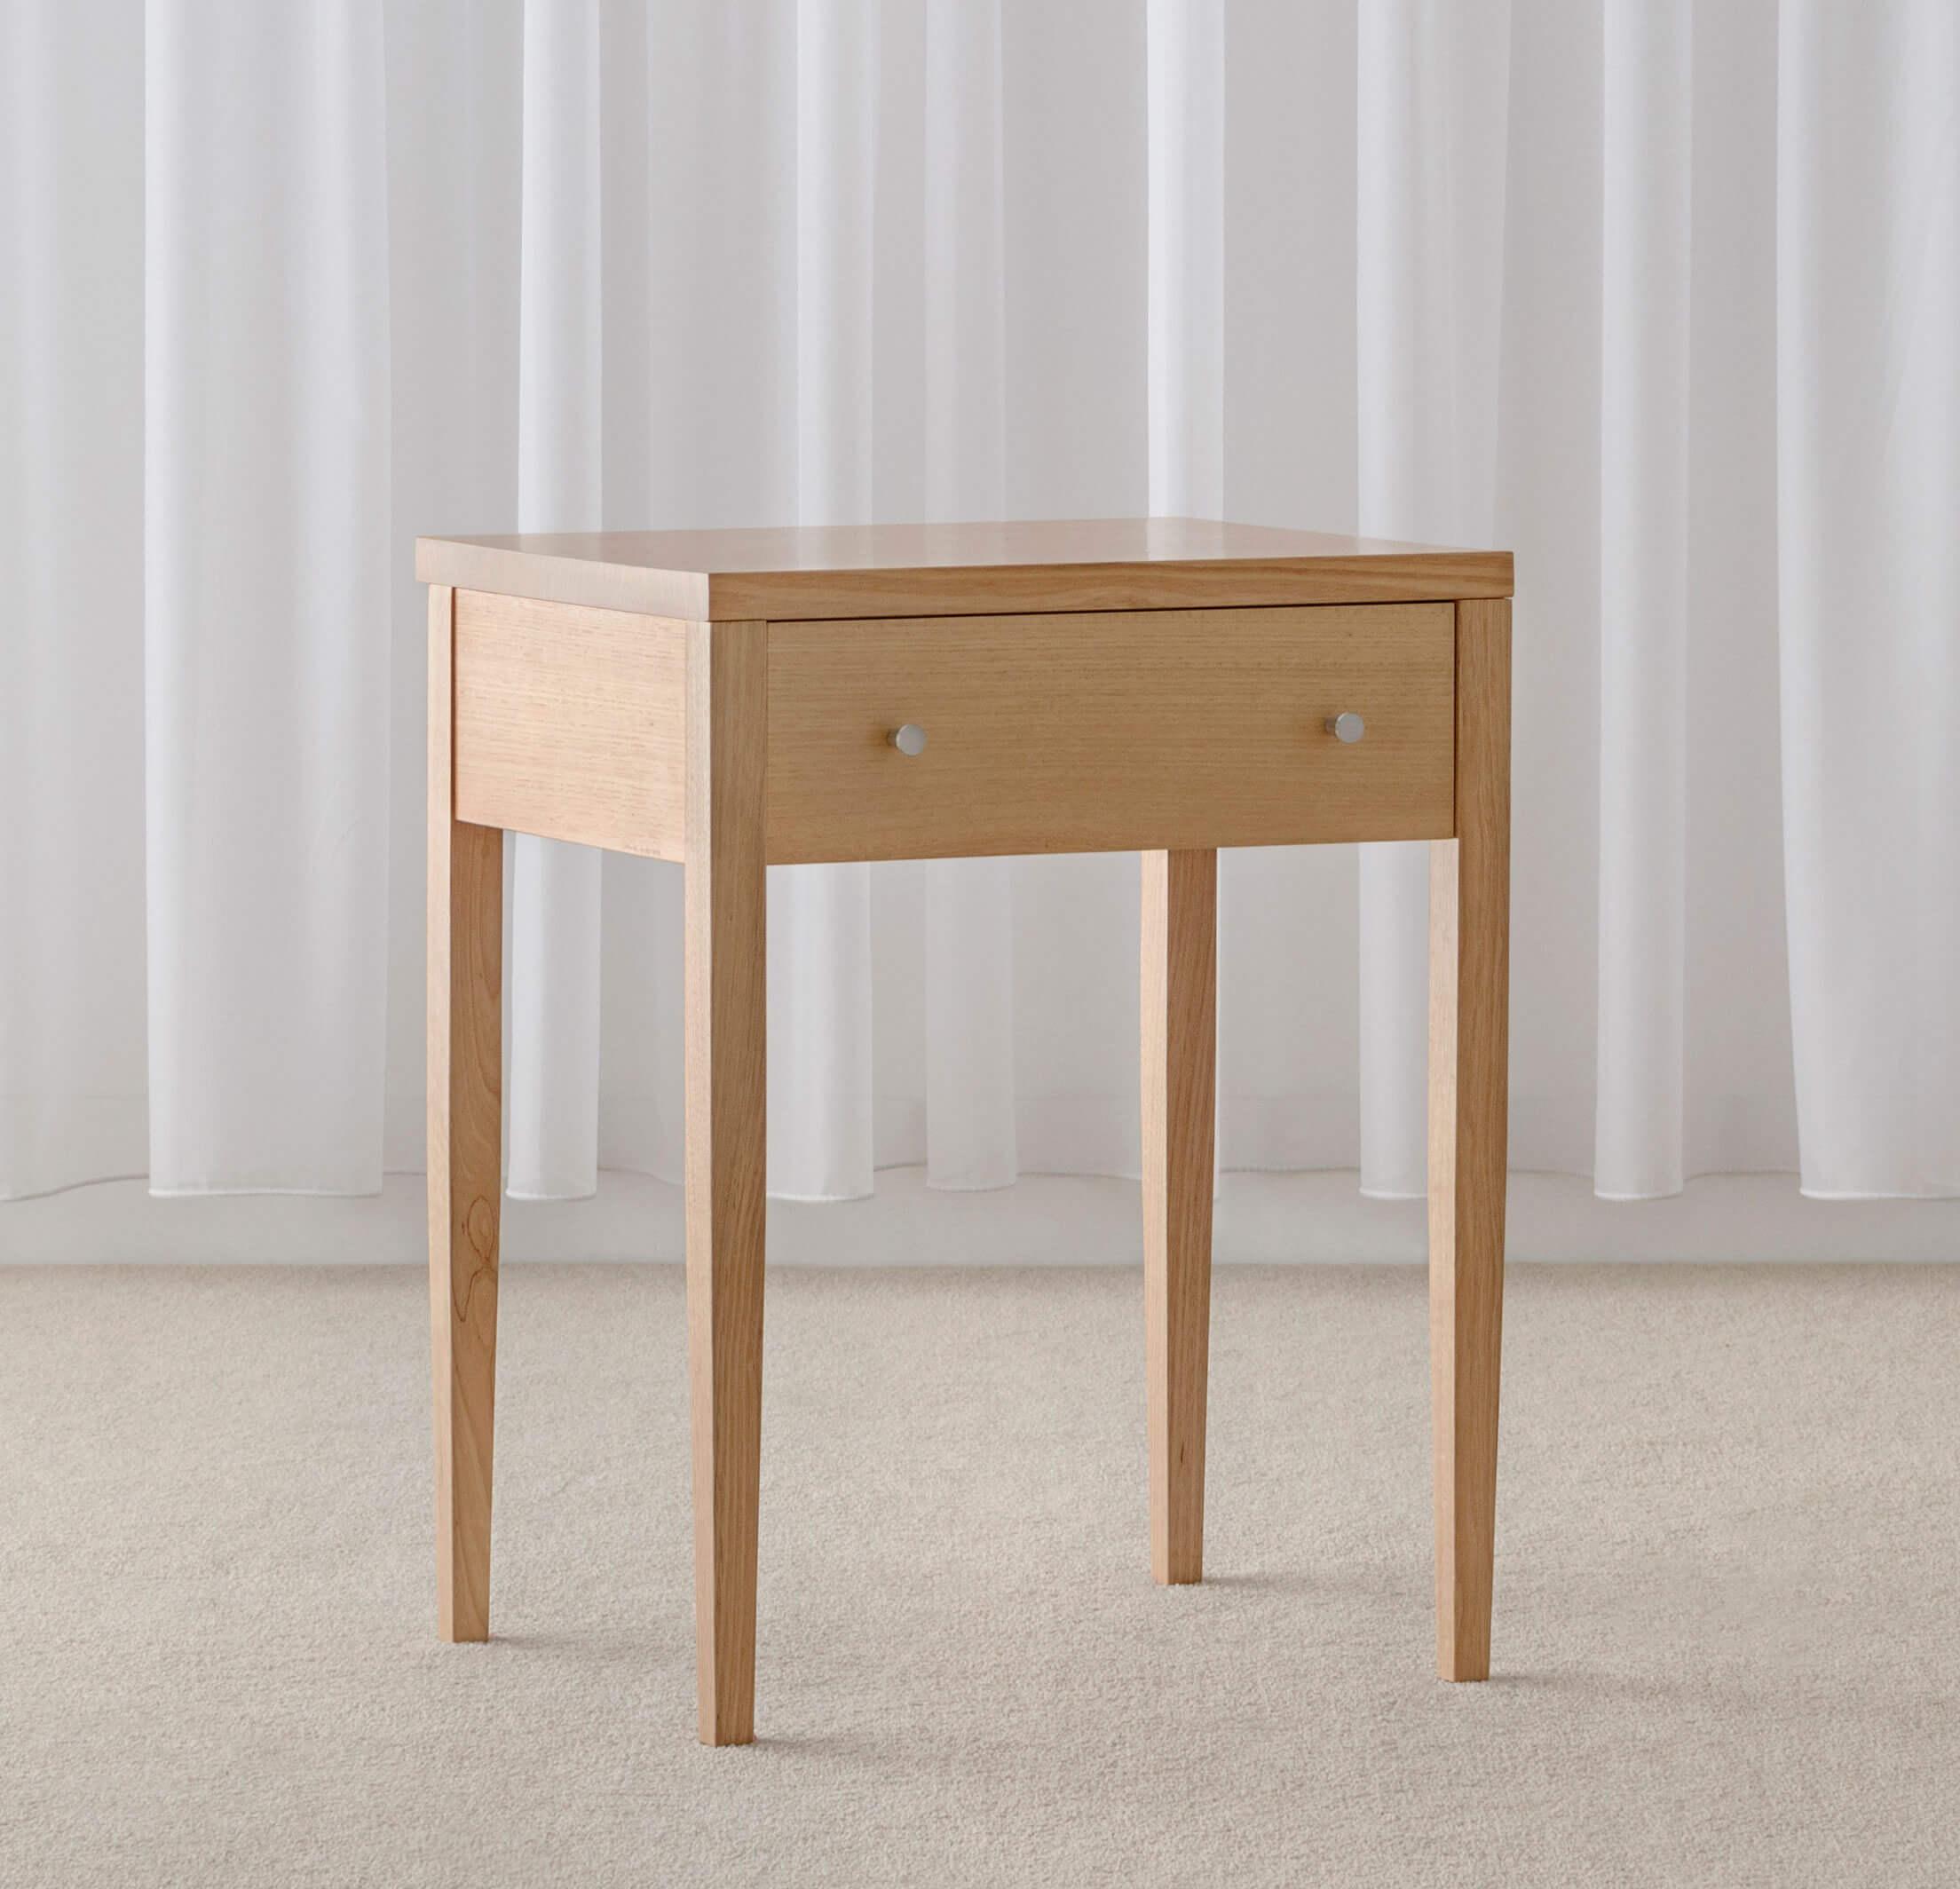 timber bedside table modern design made in Adelaide